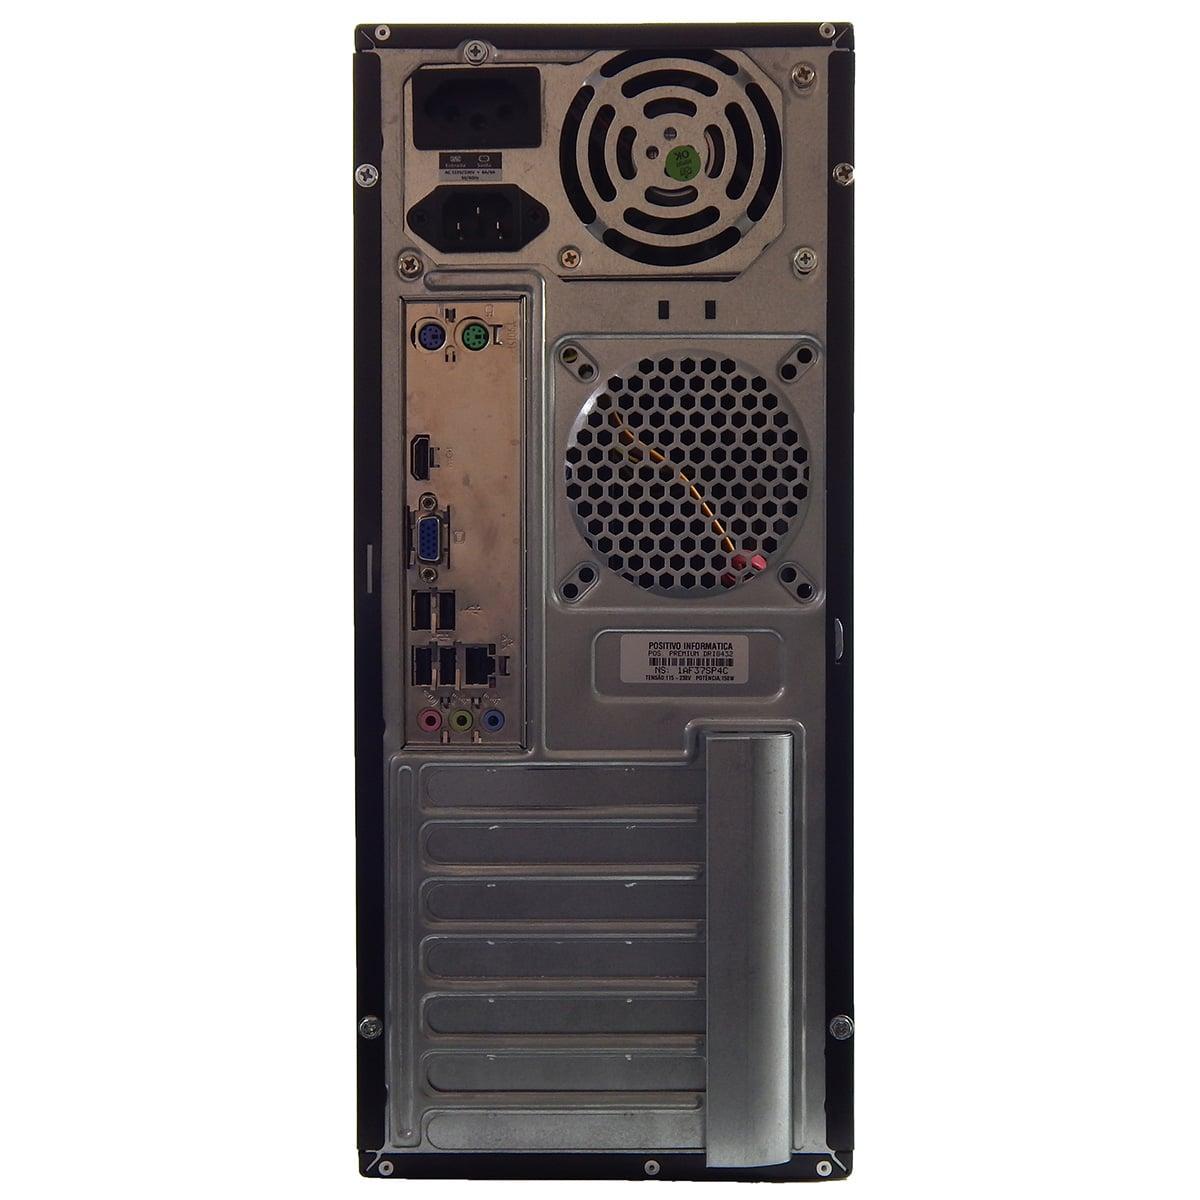 PC POSITIVO PREMIUM DR8215 I3-2120 4Gb 1Tb Gravador DVD - Reembalado